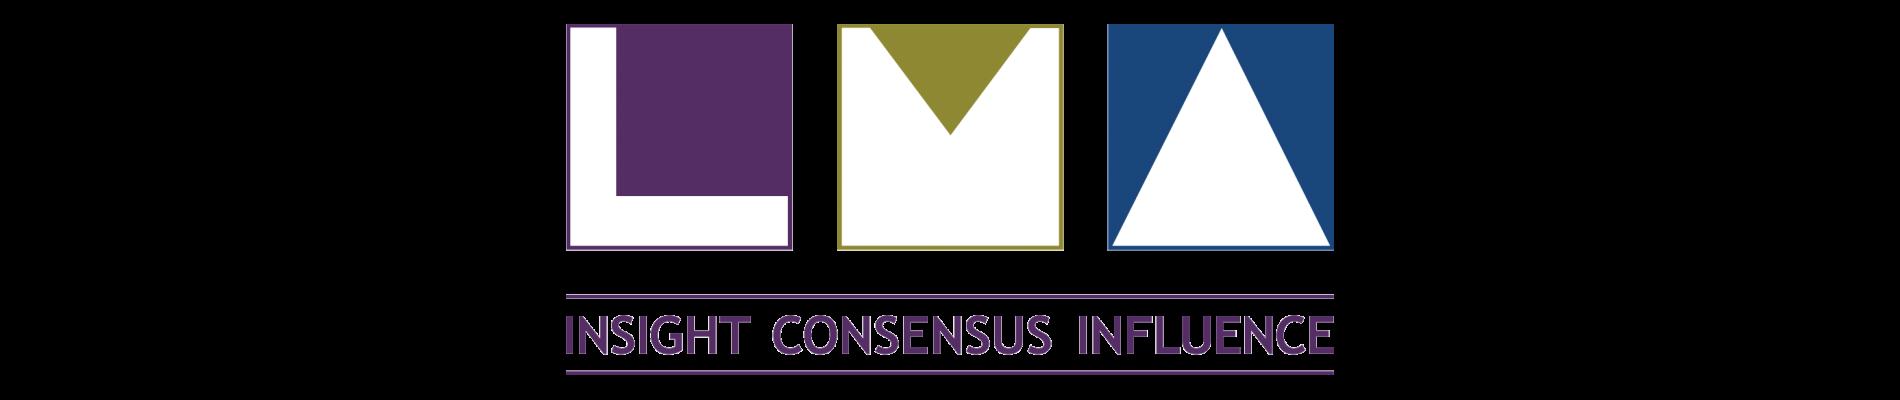 LLoyds Market Association Academy Learning Week – June 29th London